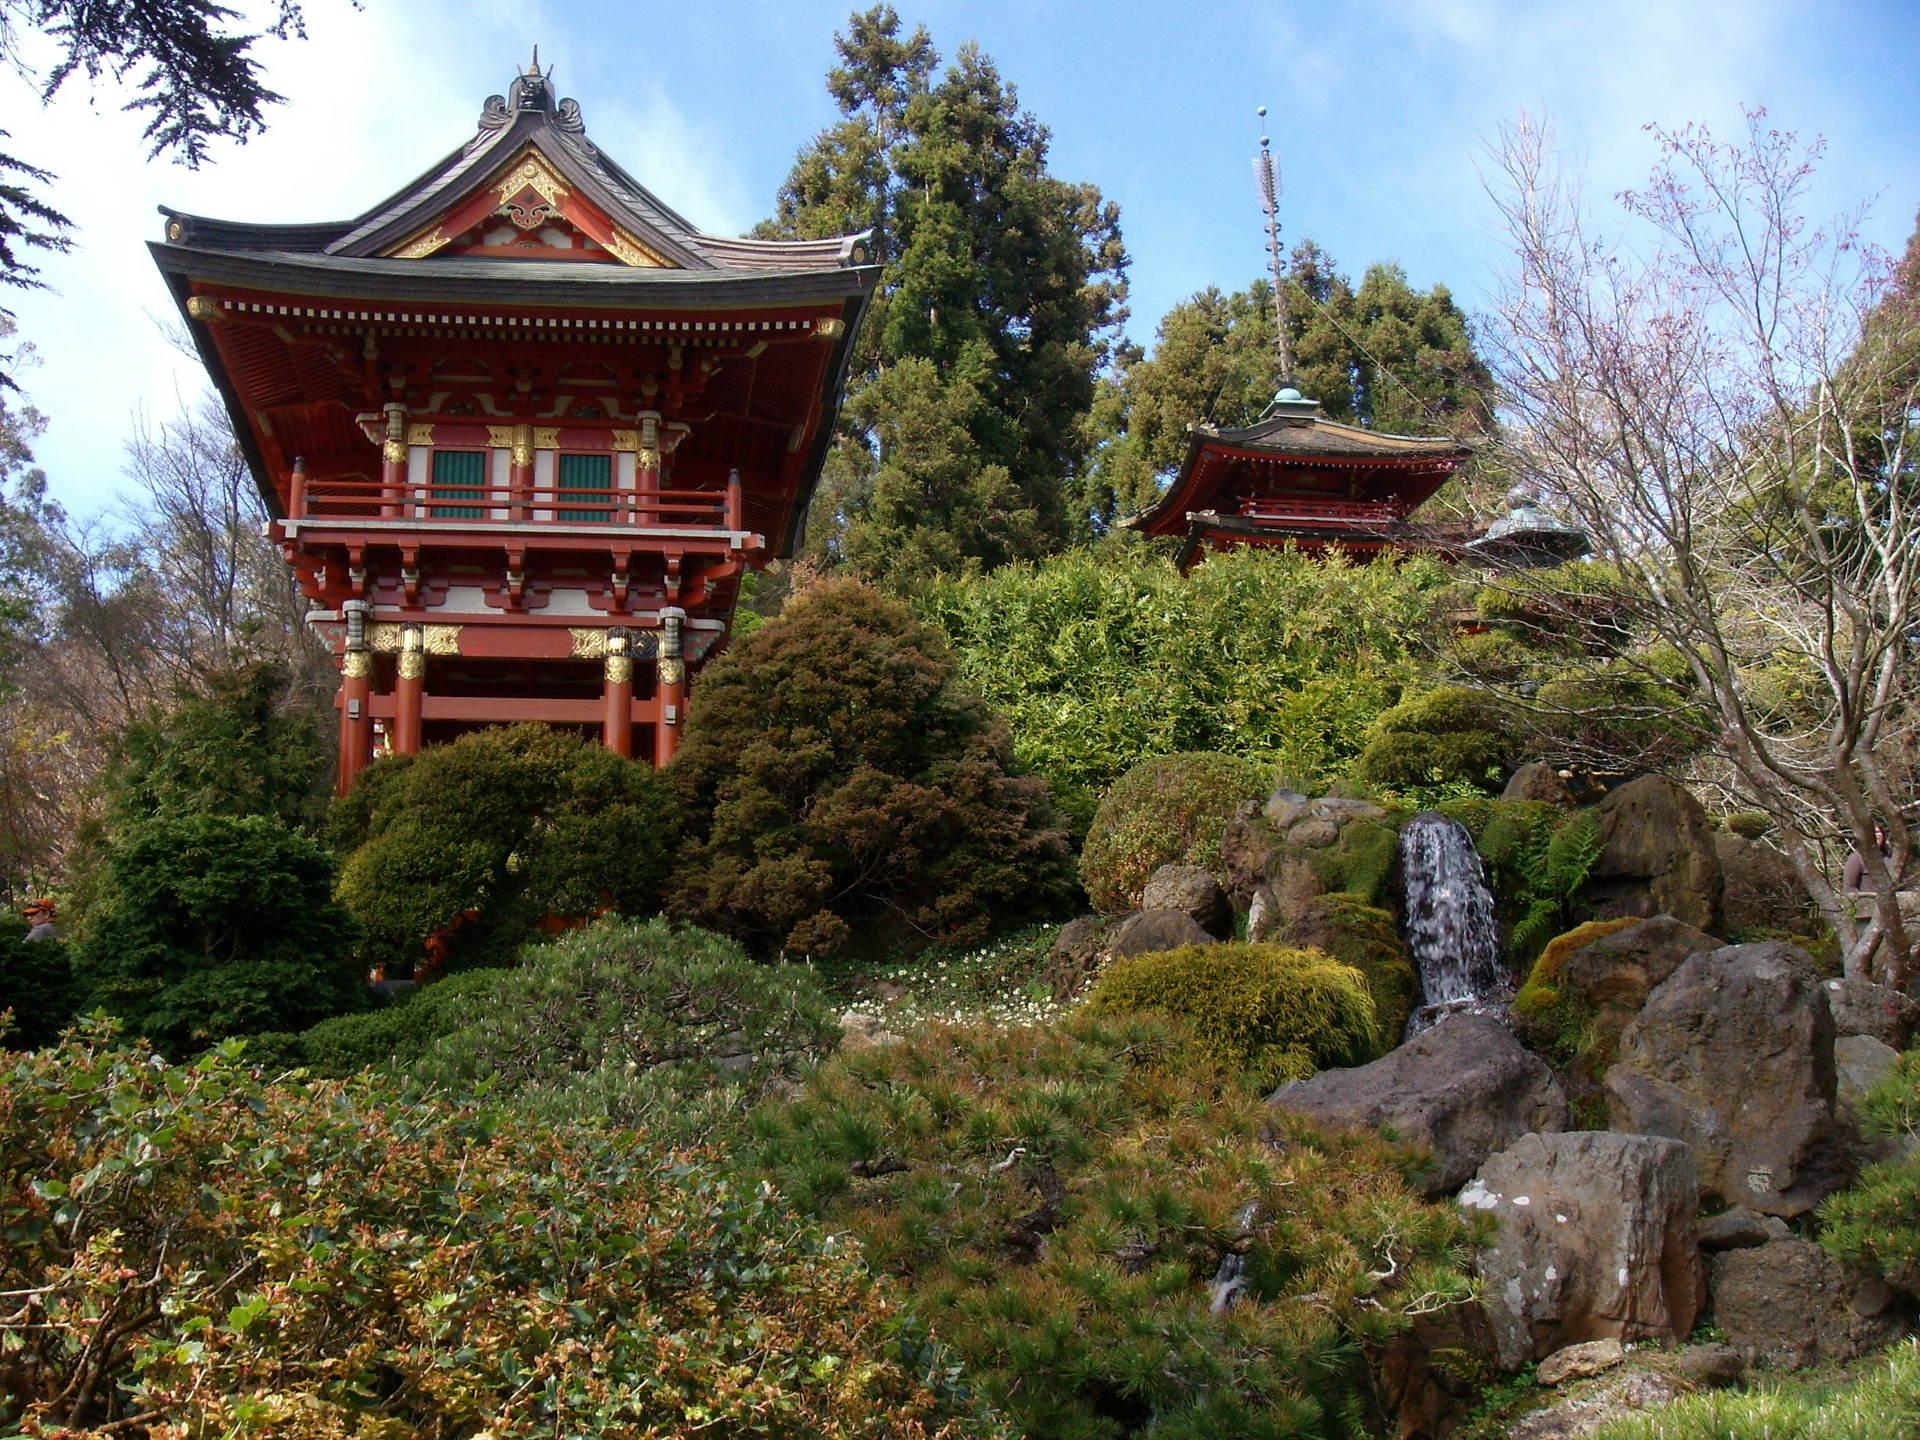 Japanese Tea Garden San Francisco Photo 962250 Fanpop